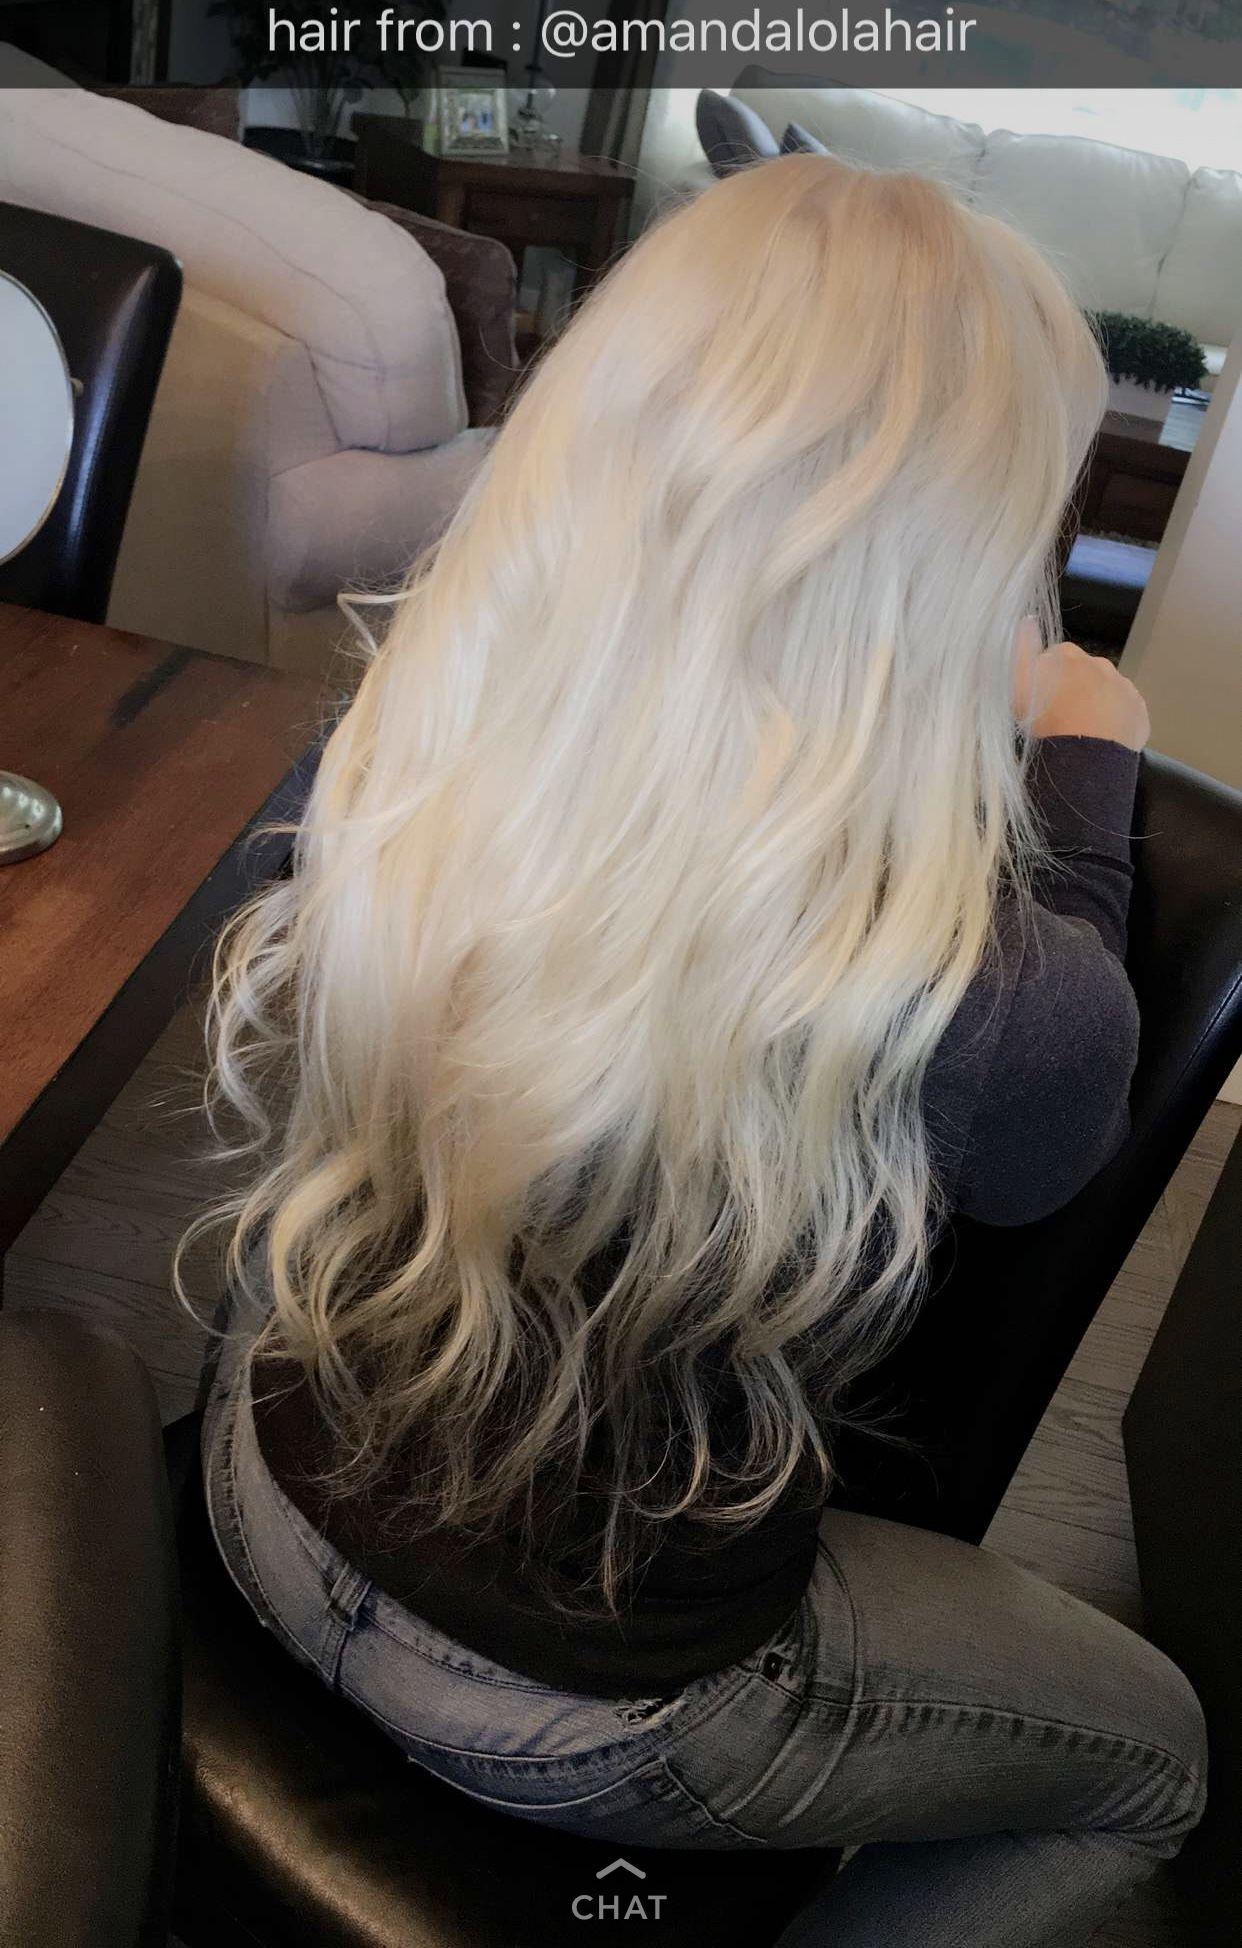 Order 613 Amandalola Hair Fairyblonde Tape In Extensions